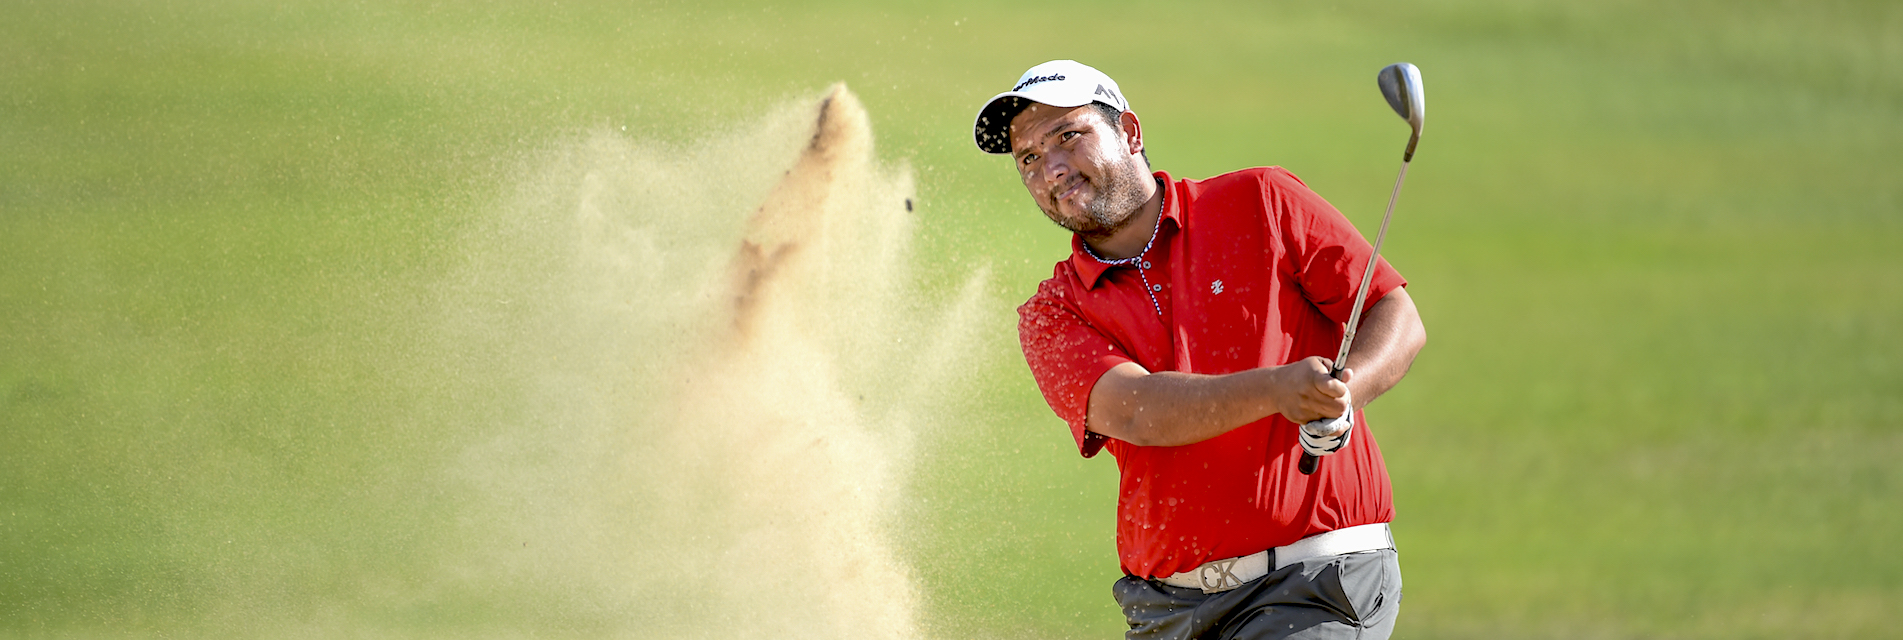 Jorge Monroy. (Photo by Enrique Berardi/PGA TOUR)